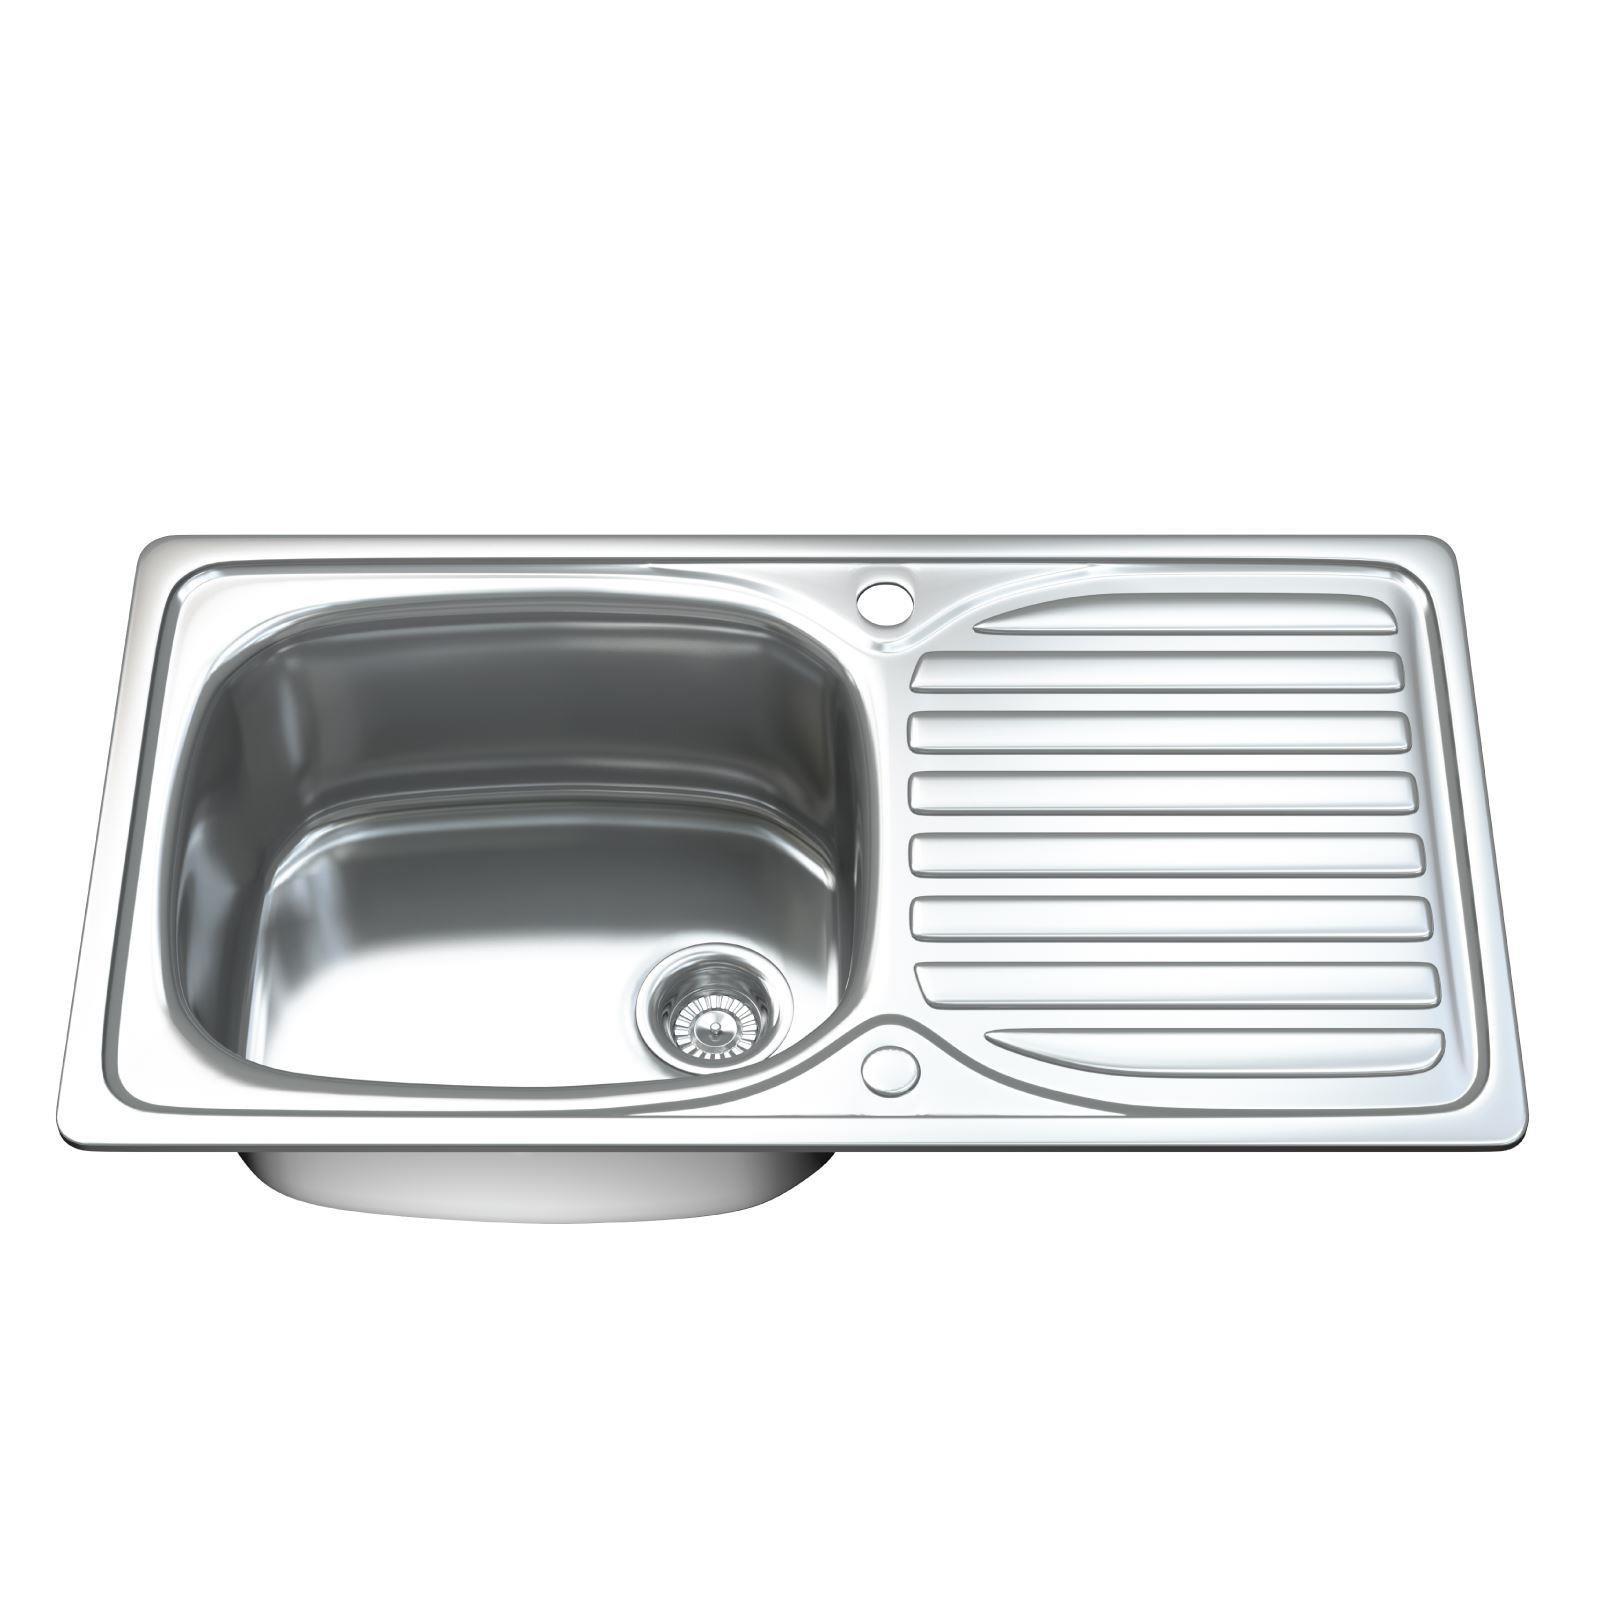 Kitchens Direct Kitchen Design Appliances 1004 Single Bowl Kitchen Sink